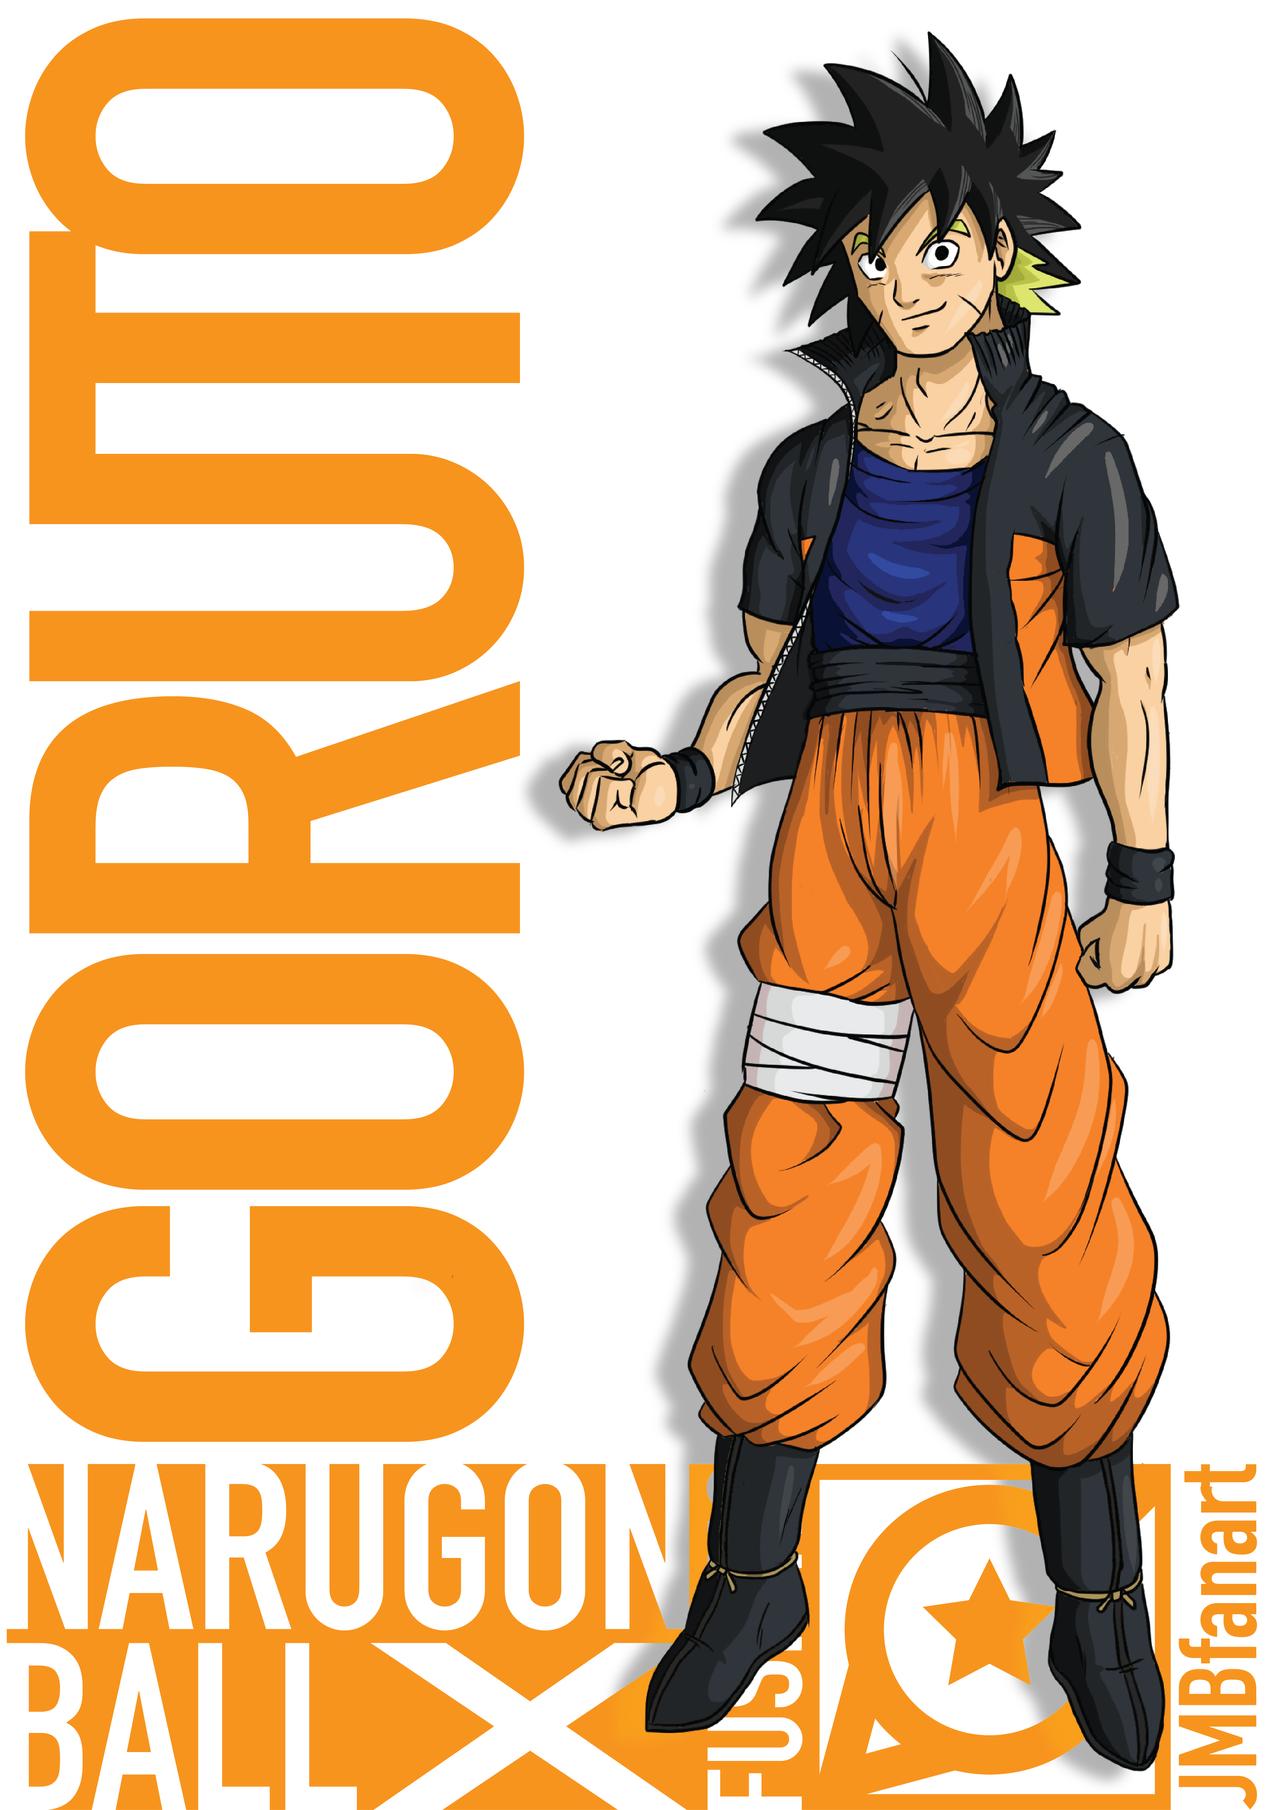 Goruto goku and naruto fusion by jmbfanart on deviantart - Dbz et one piece ...